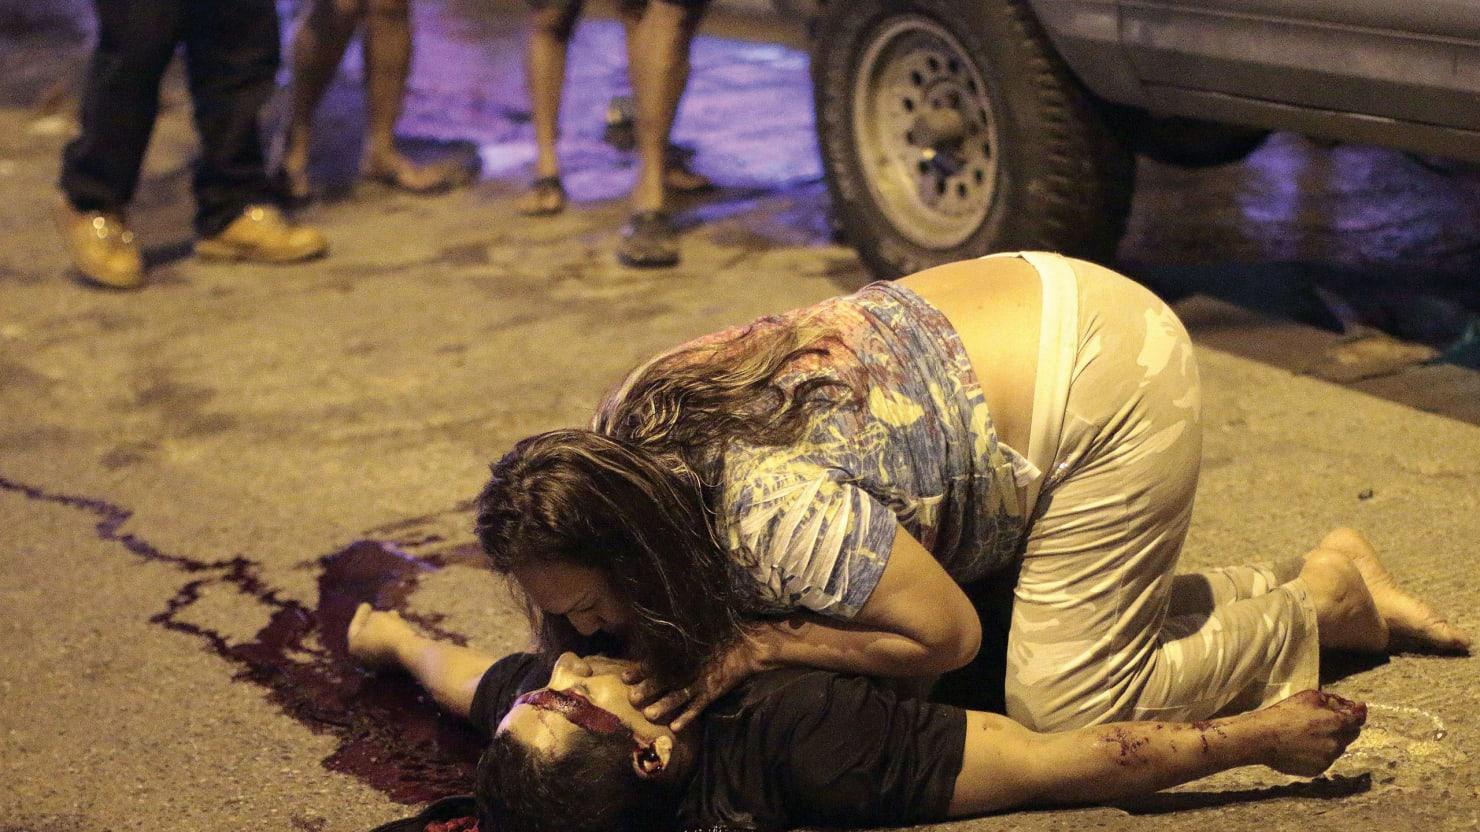 Mexico's Bloodbath That Won't Stop